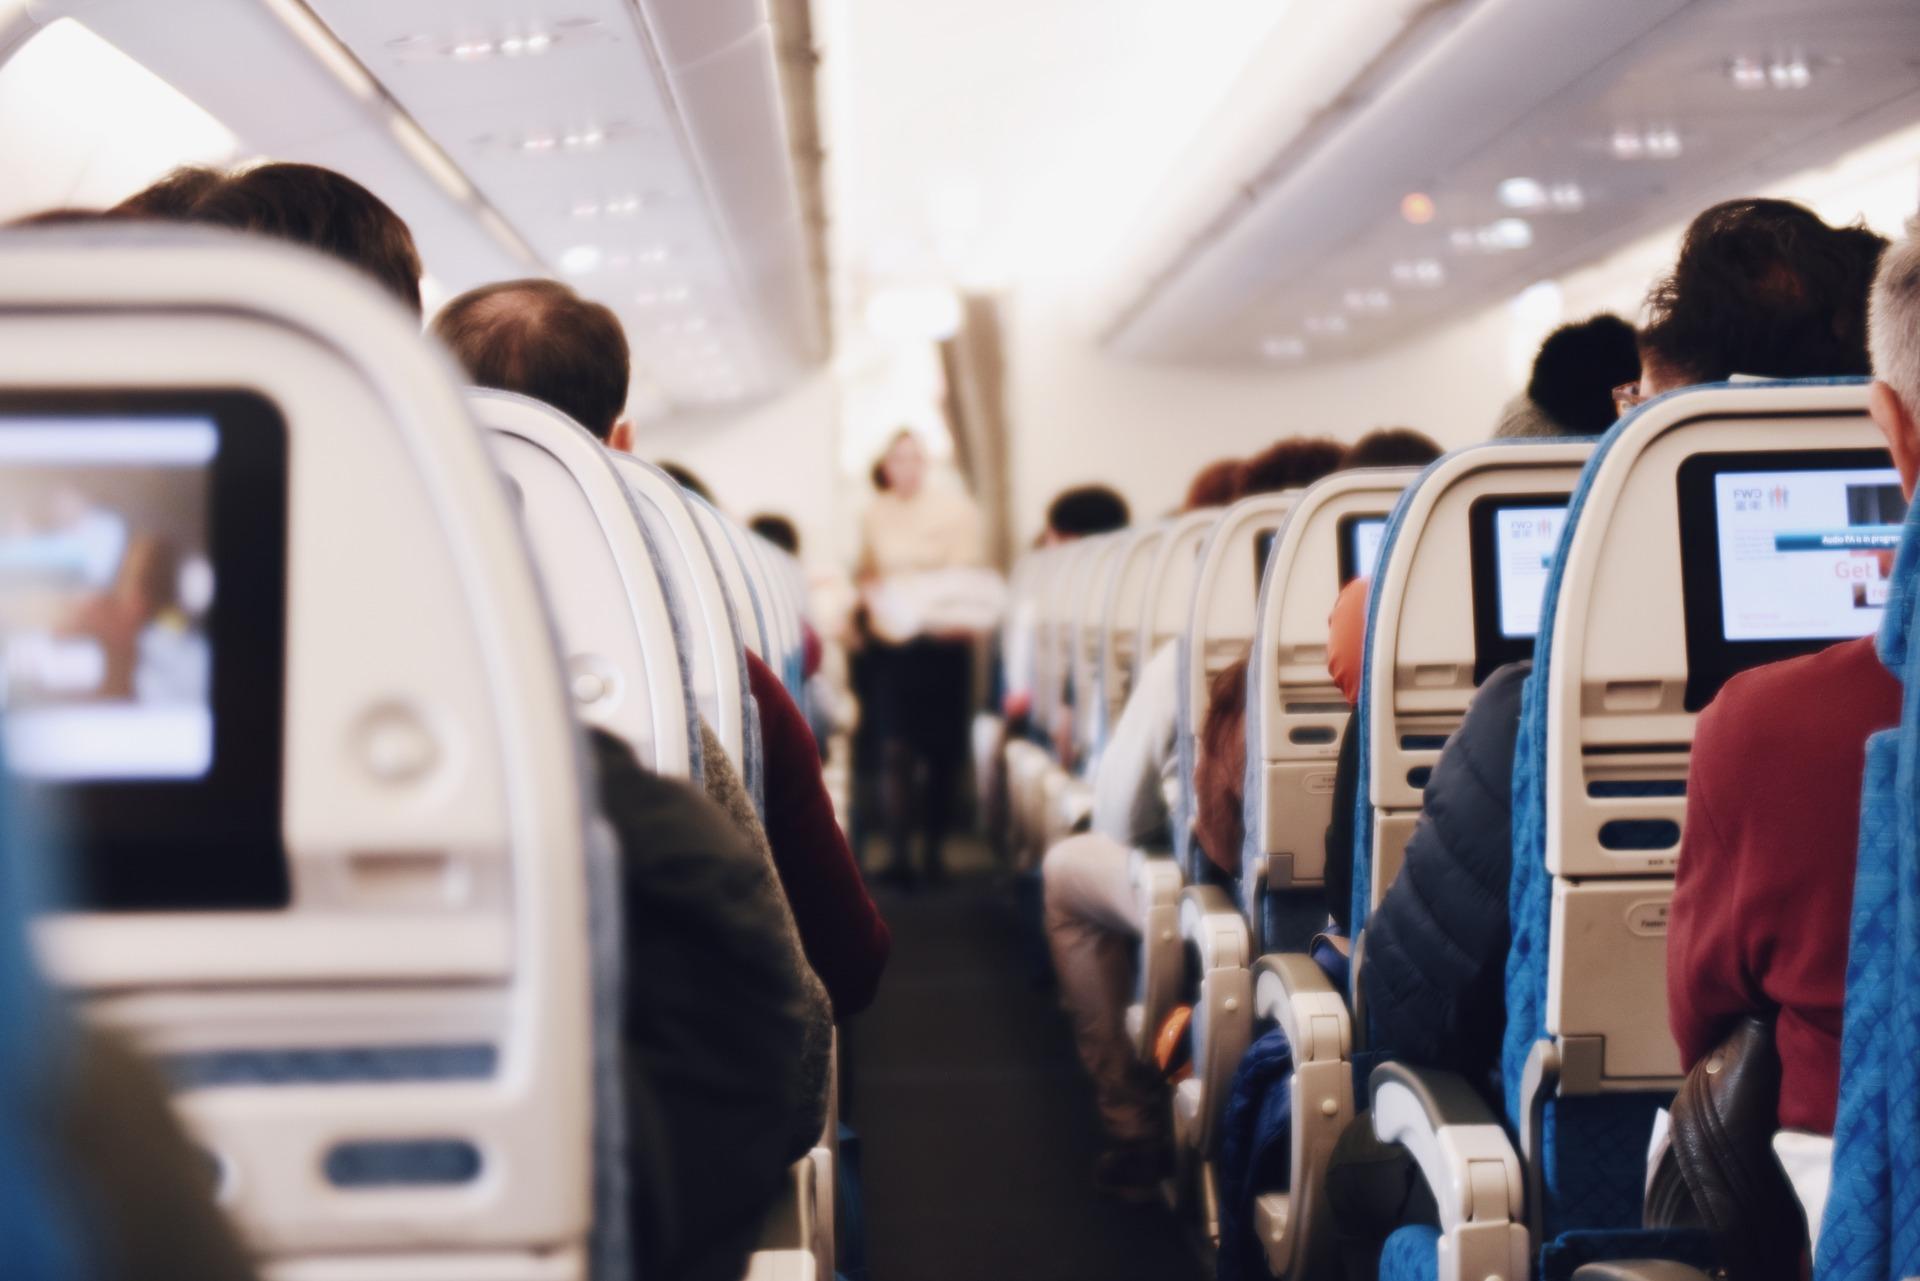 View of a plane aisle